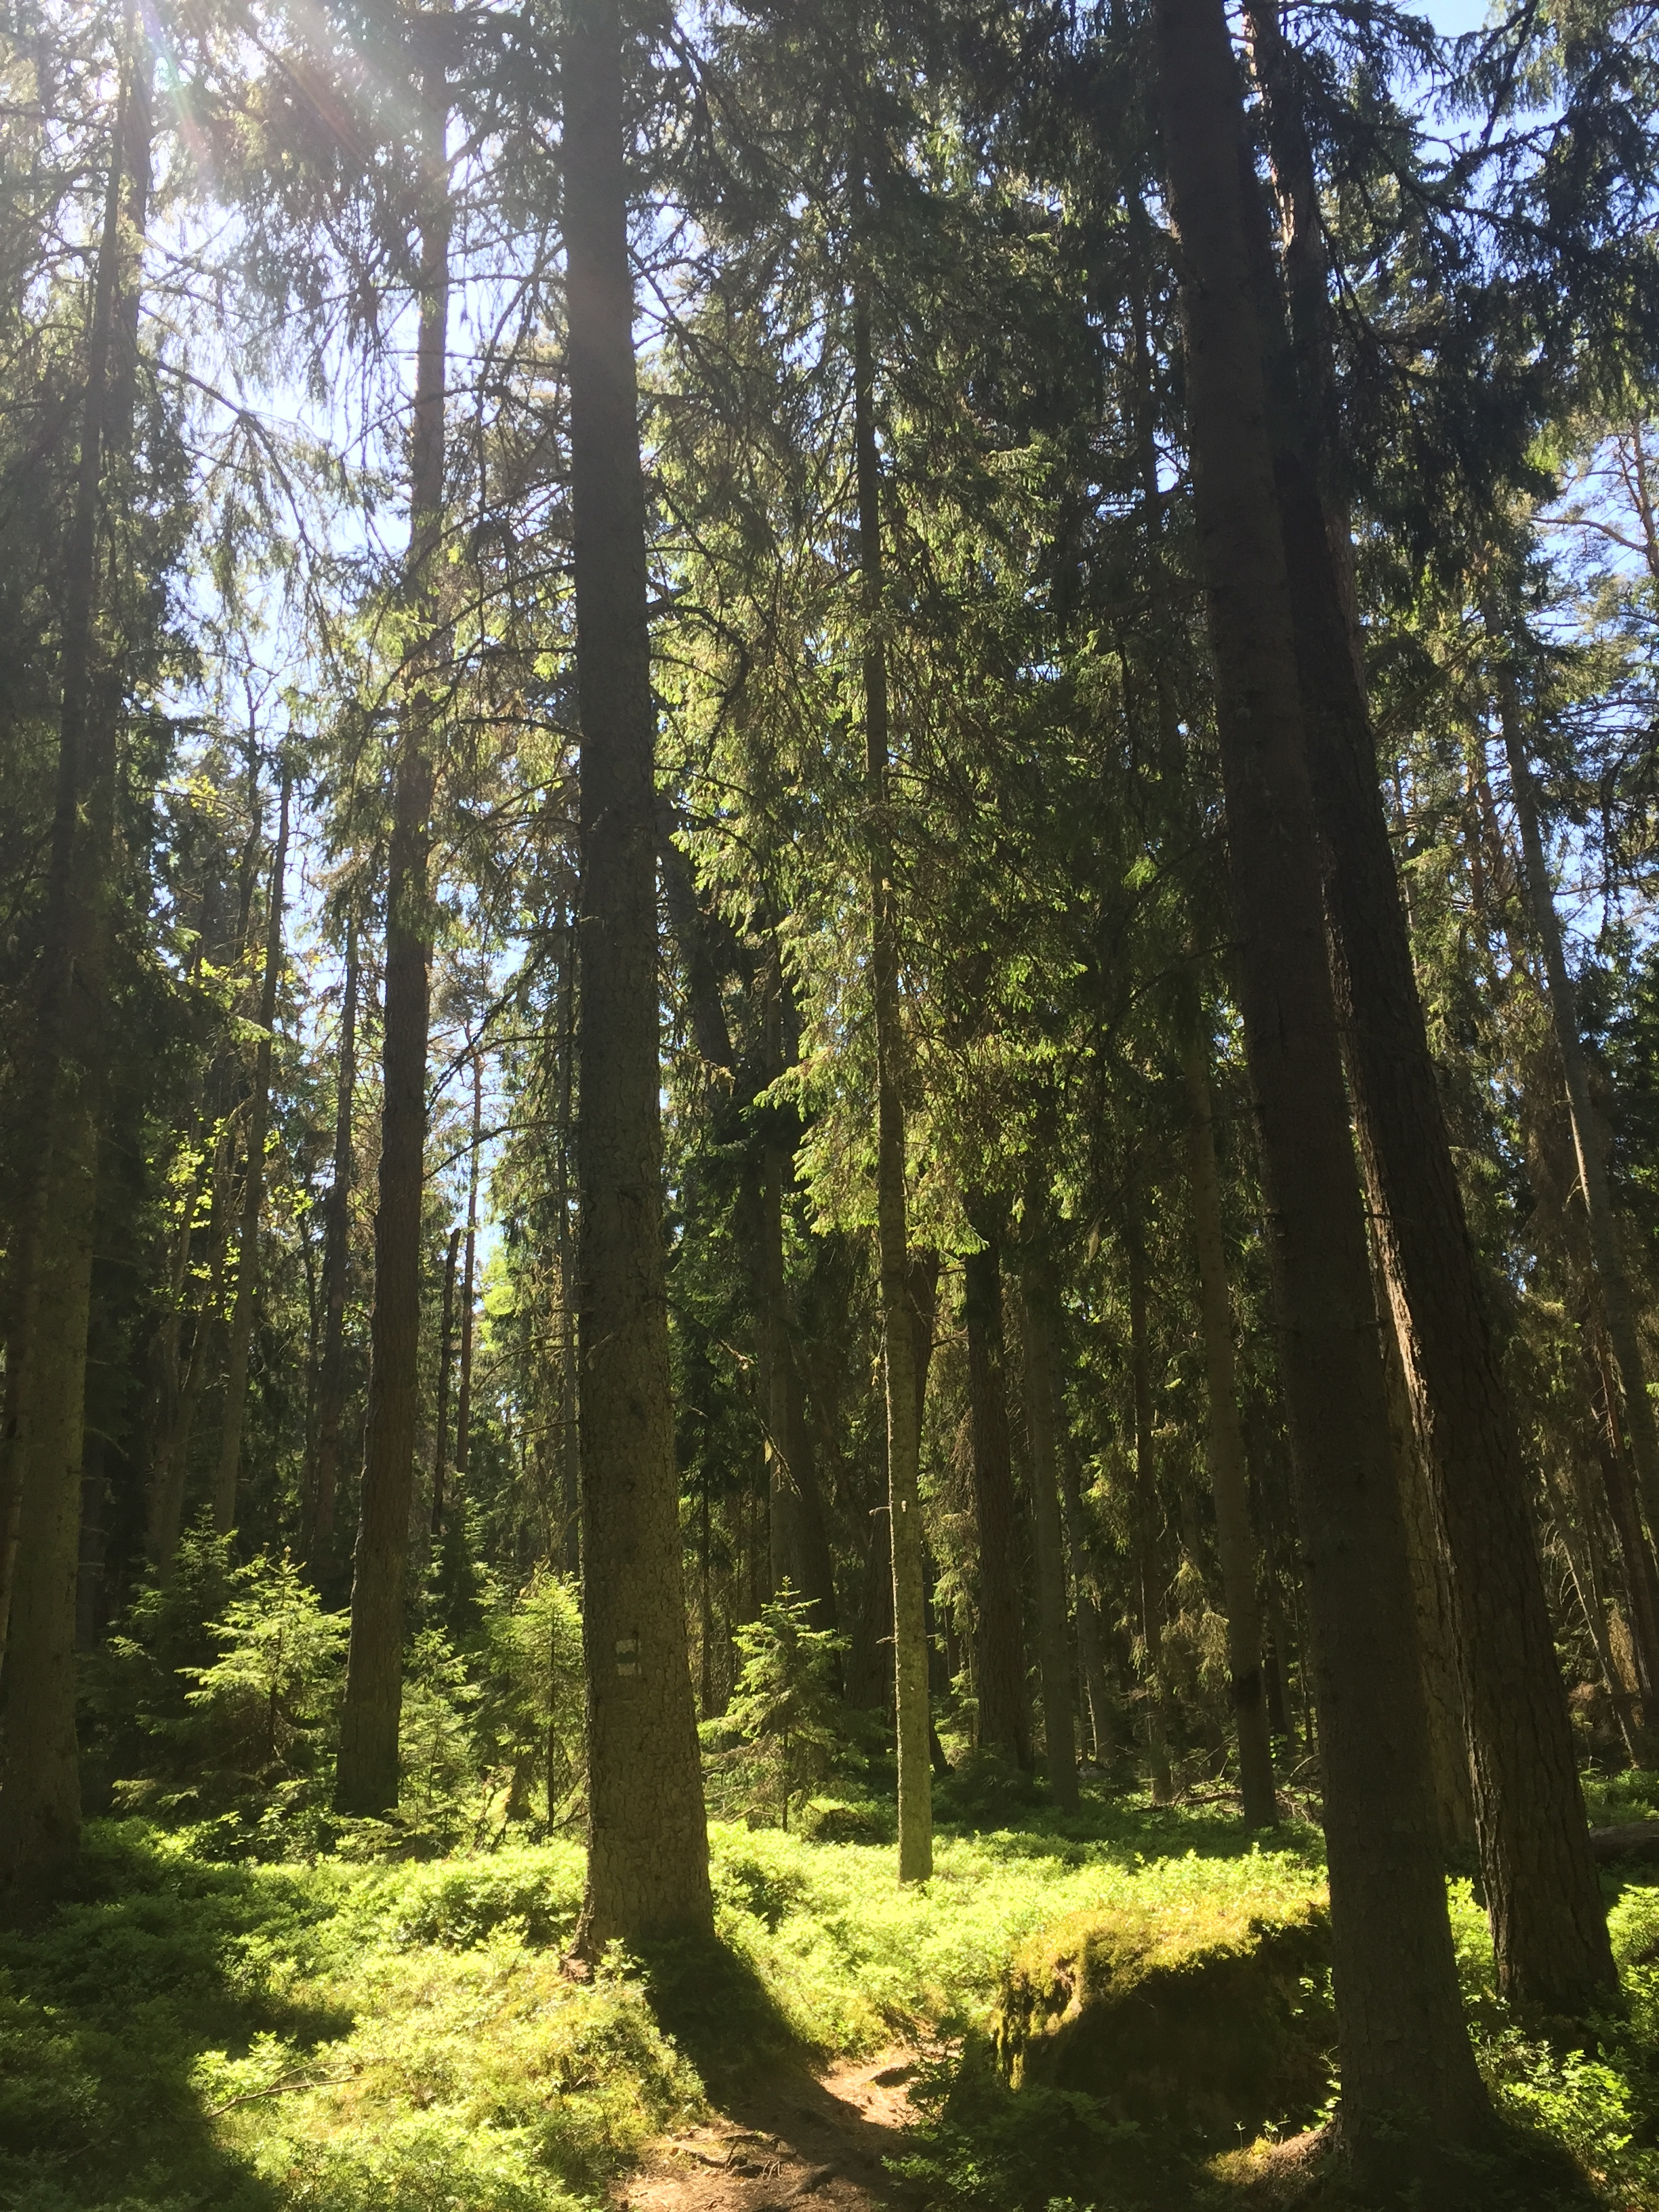 The woods of Laheema